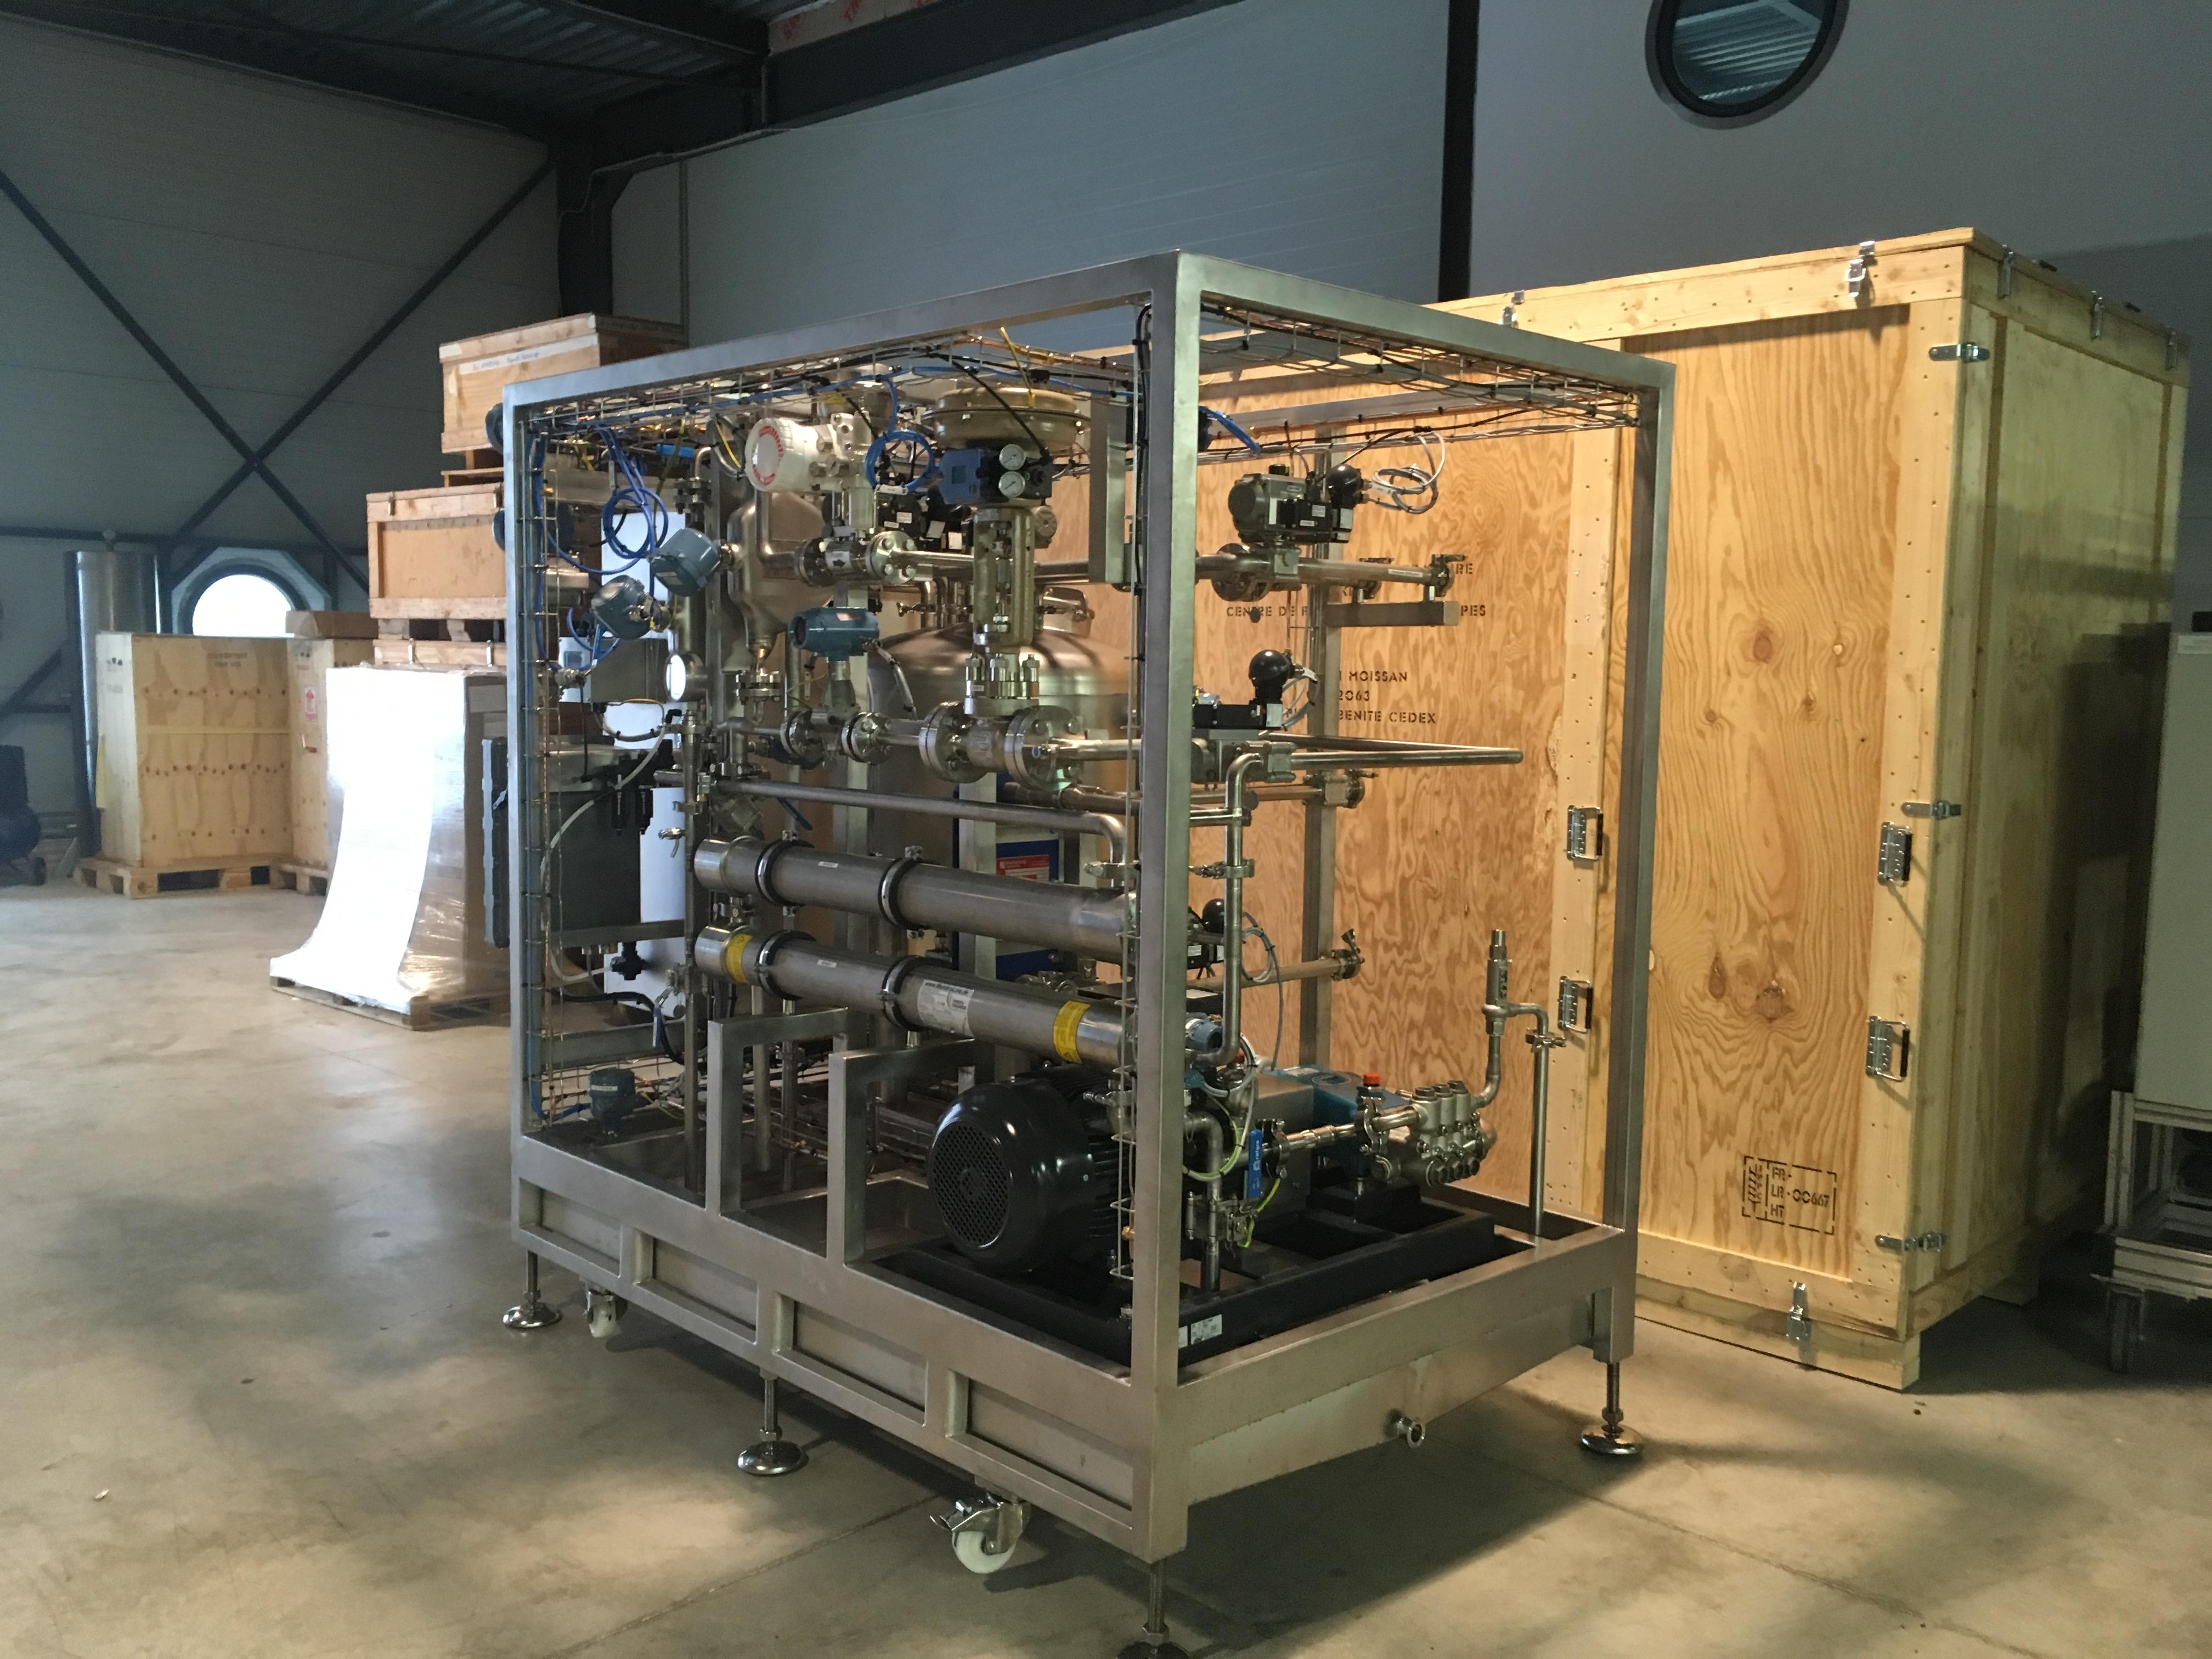 Livraison D'un Pilote Osmose Inverse / Nanofiltration Version ATEX